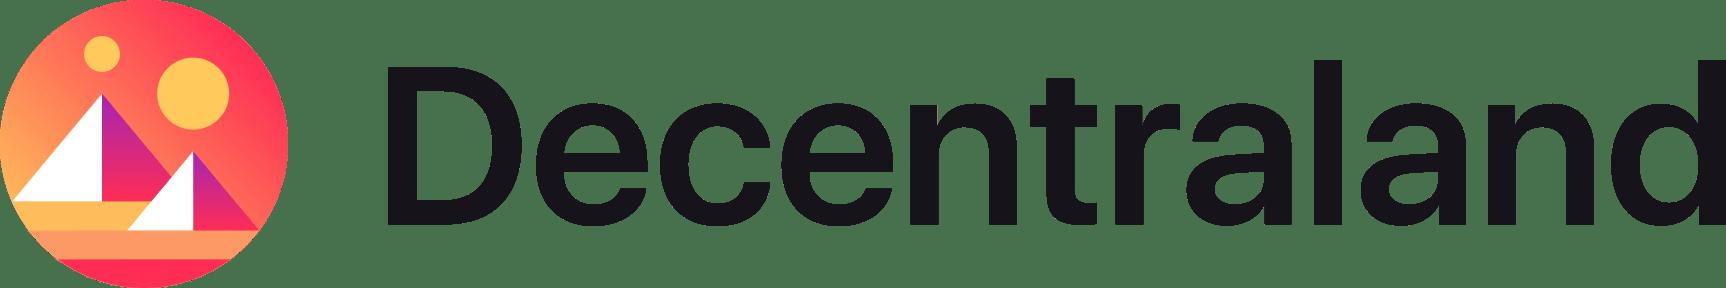 Decentraland Marketplace logo